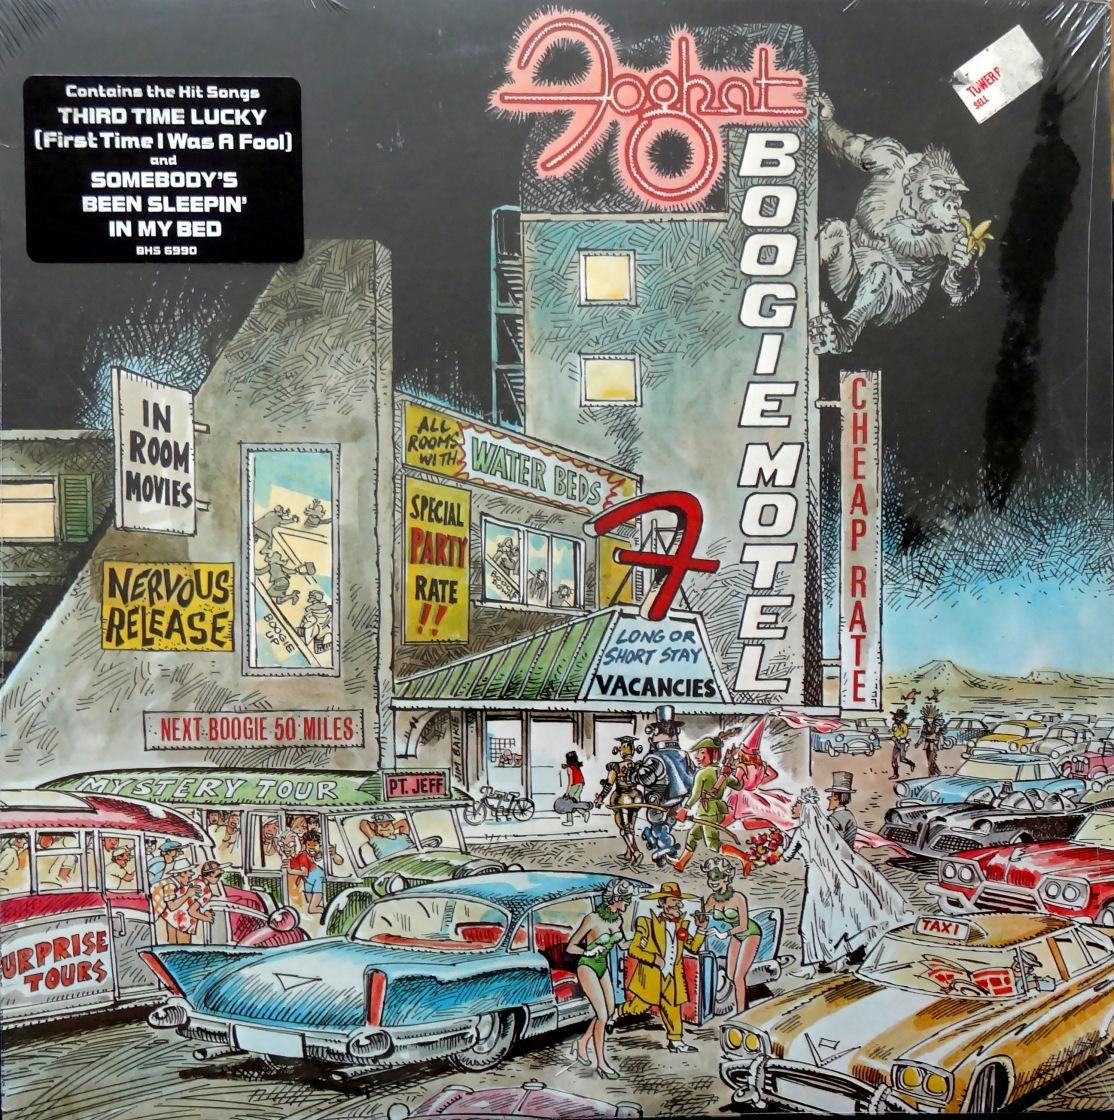 Foghat Boogie Motel front